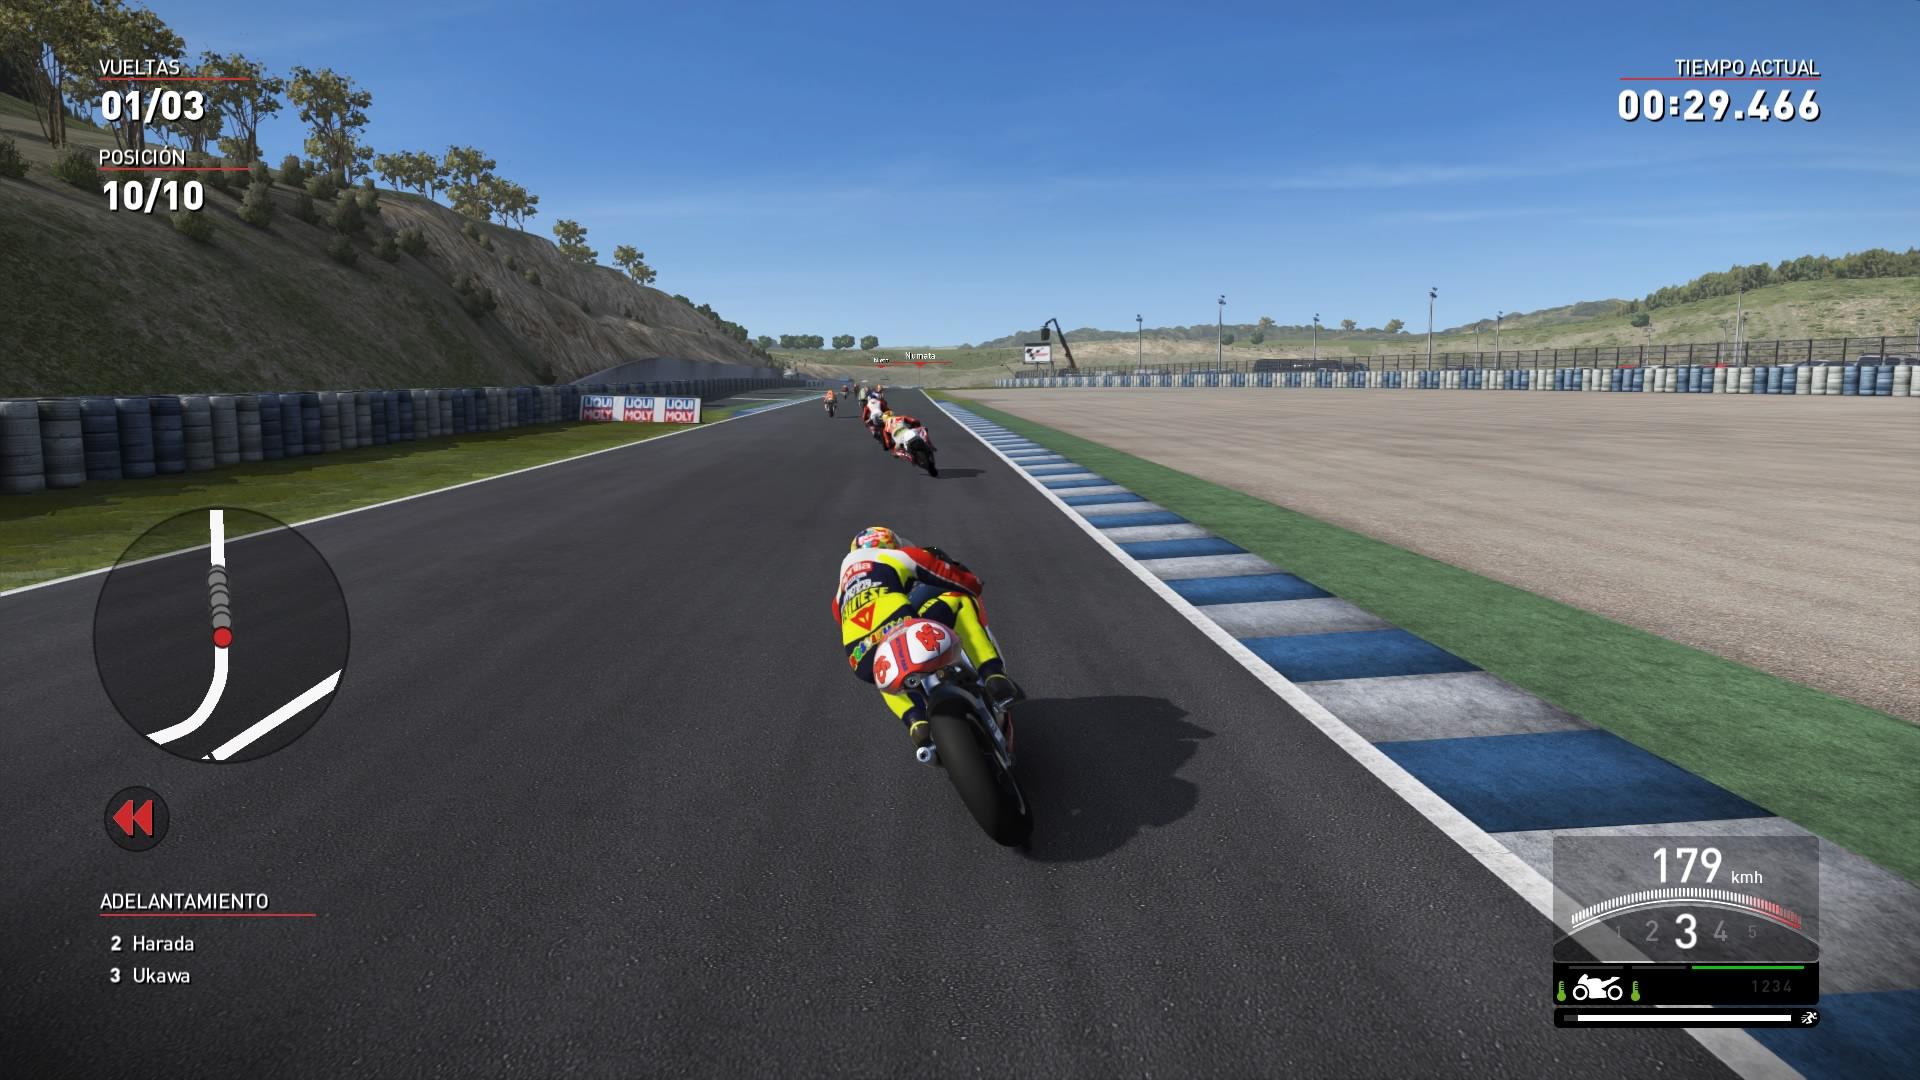 Valentino Rossi: The Game - Avance para PS4, Xbox One y PC - HobbyConsolas Juegos